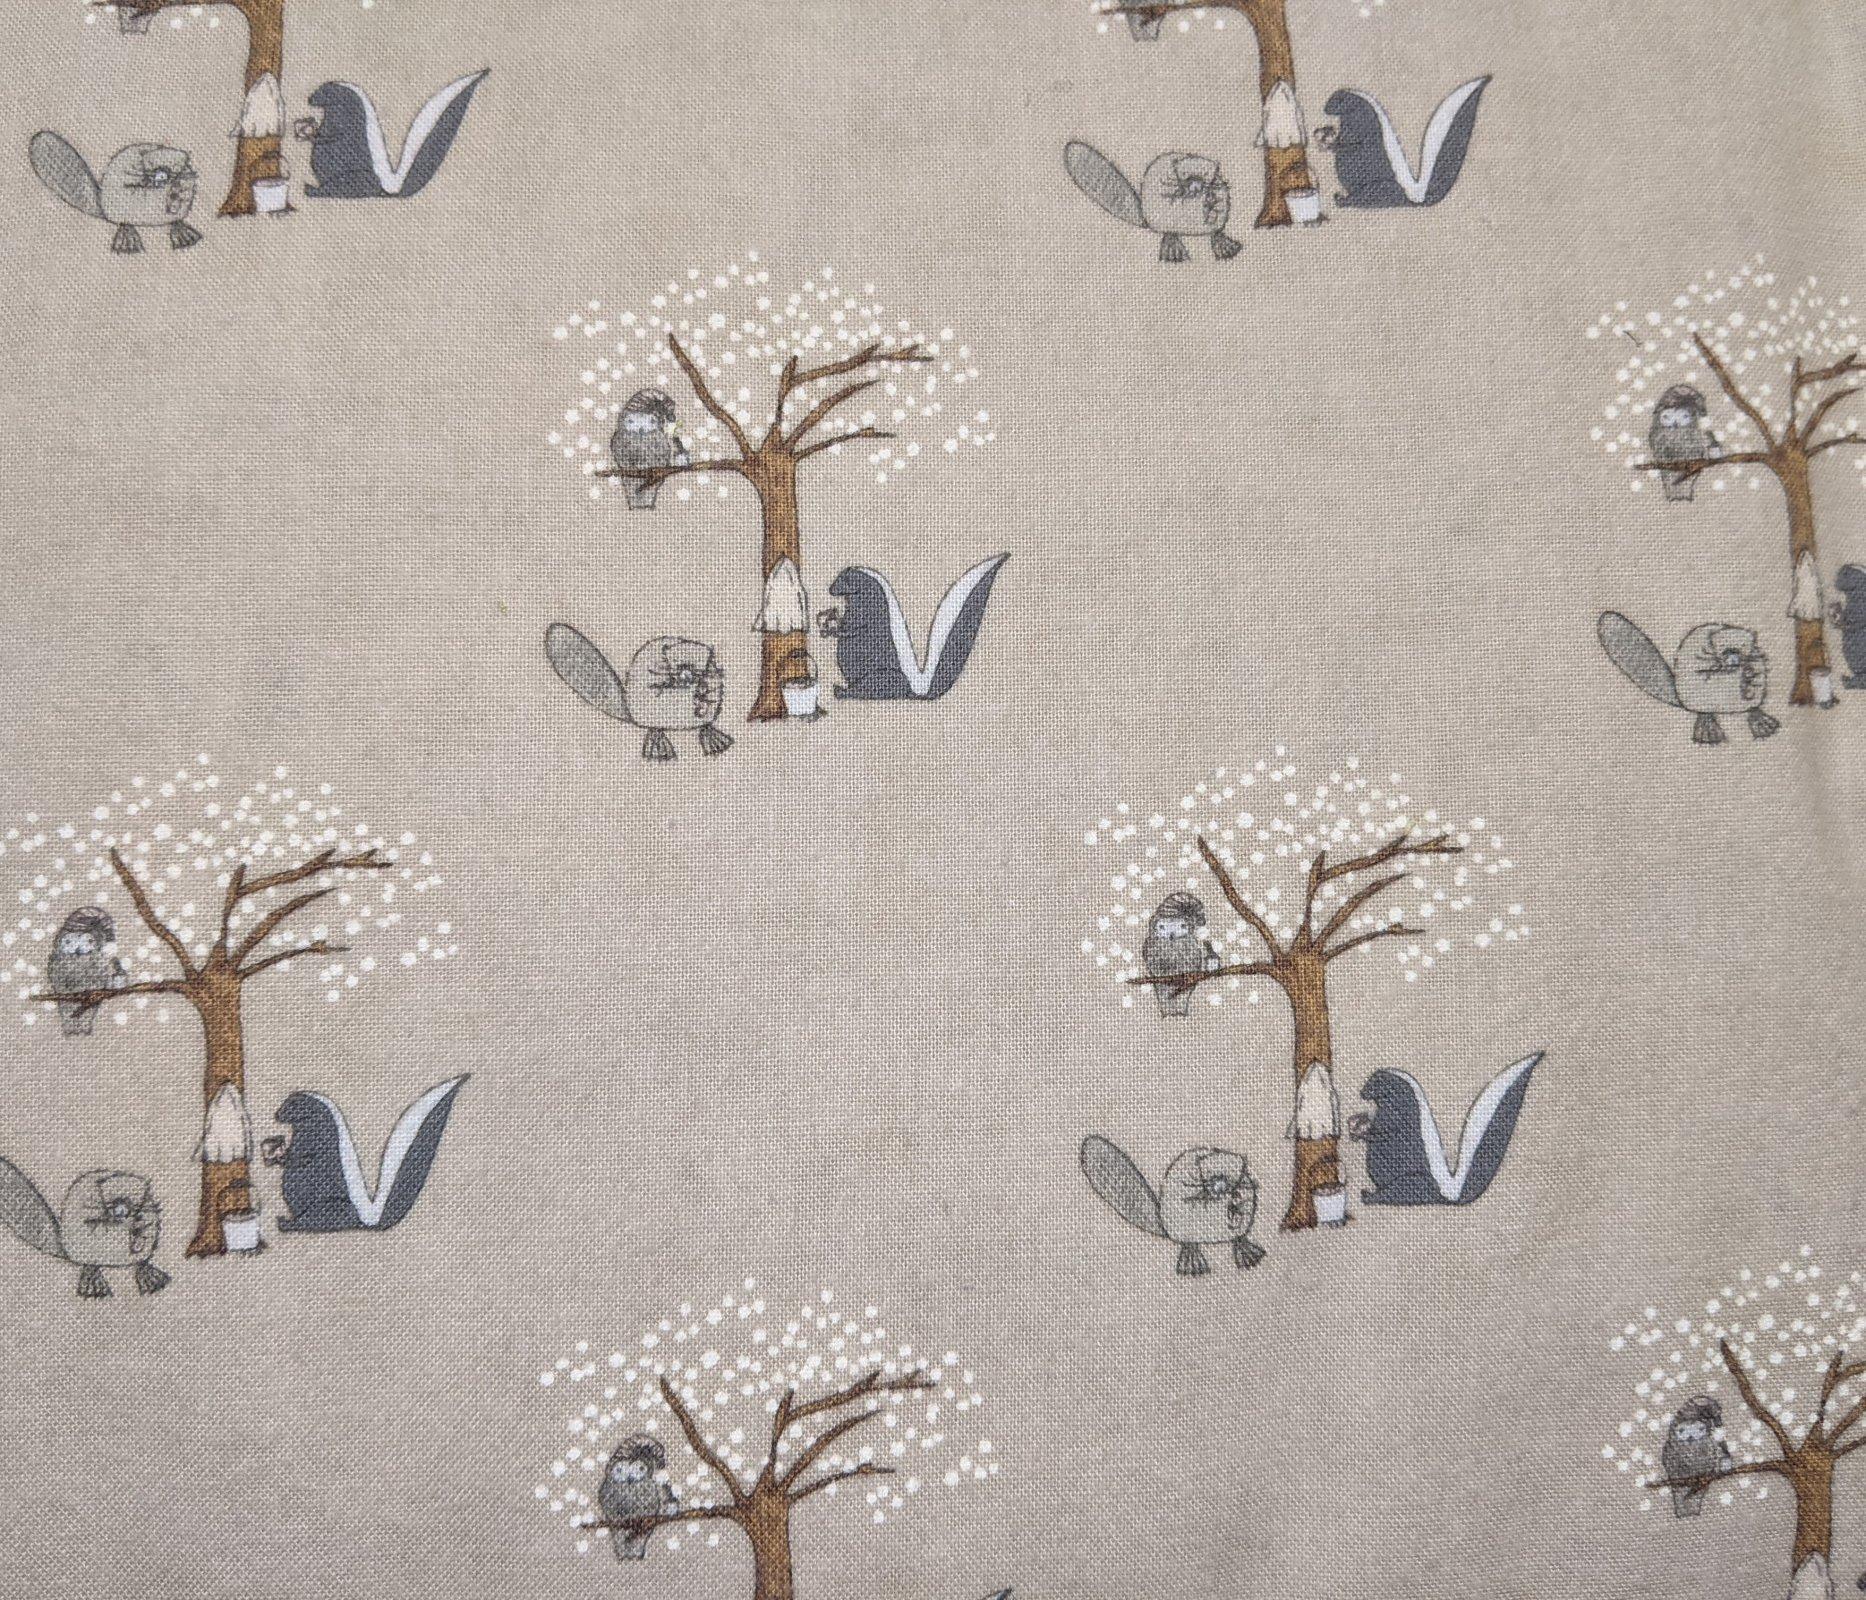 Hushabye Hollow Brushed Cotton 49011-18B by Lydia Nelson